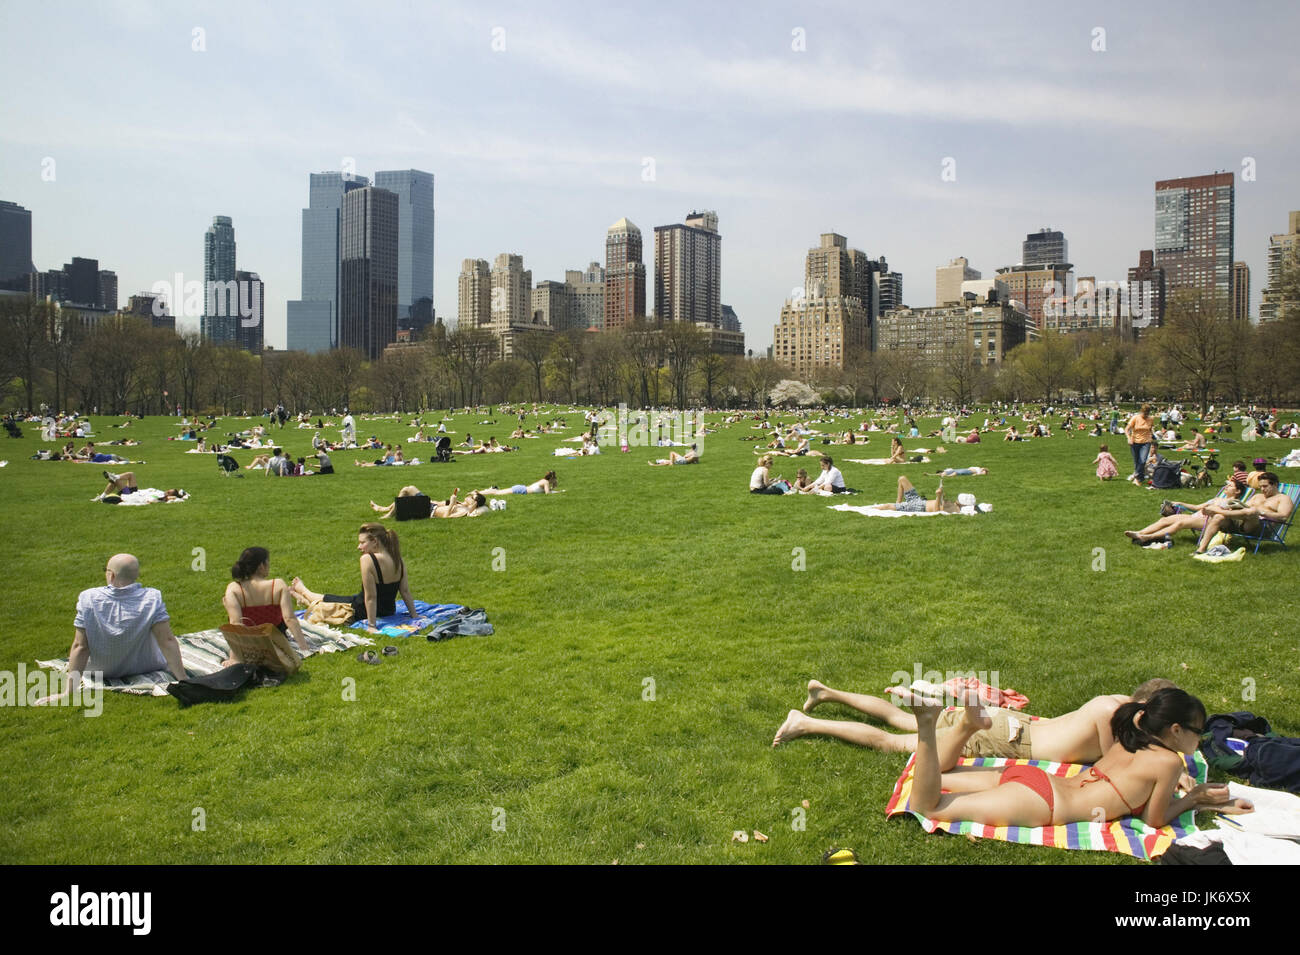 USA, New York City, Manhattan, Central  Park, Sheep Meadow, Besucher, Sonnen, Entspannung Amerika, Nordamerika, - Stock Image